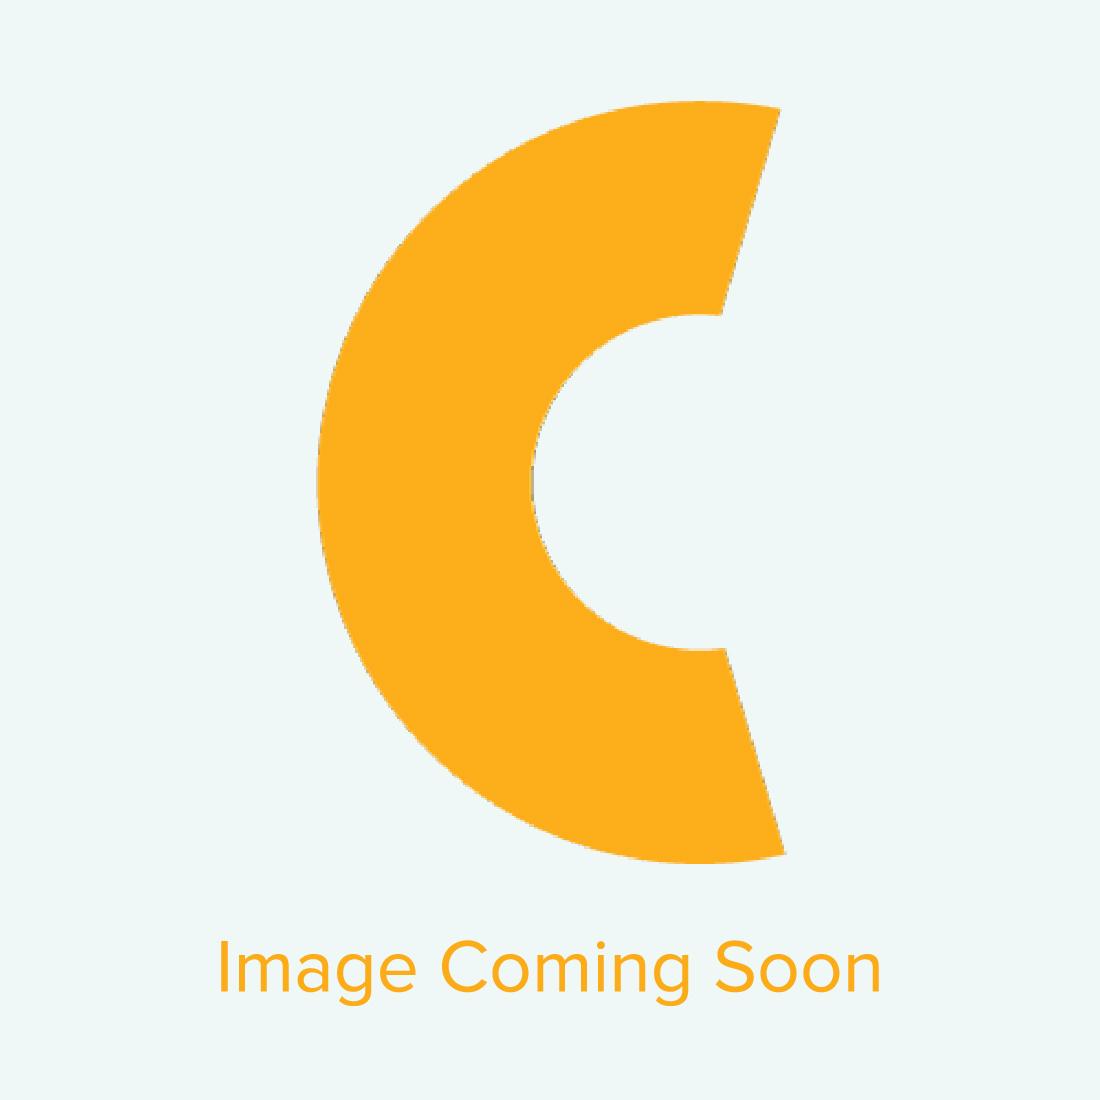 Small Metal Display Easel Back for ChromaLuxe Panels-SB4060CS - OVERSTOCK